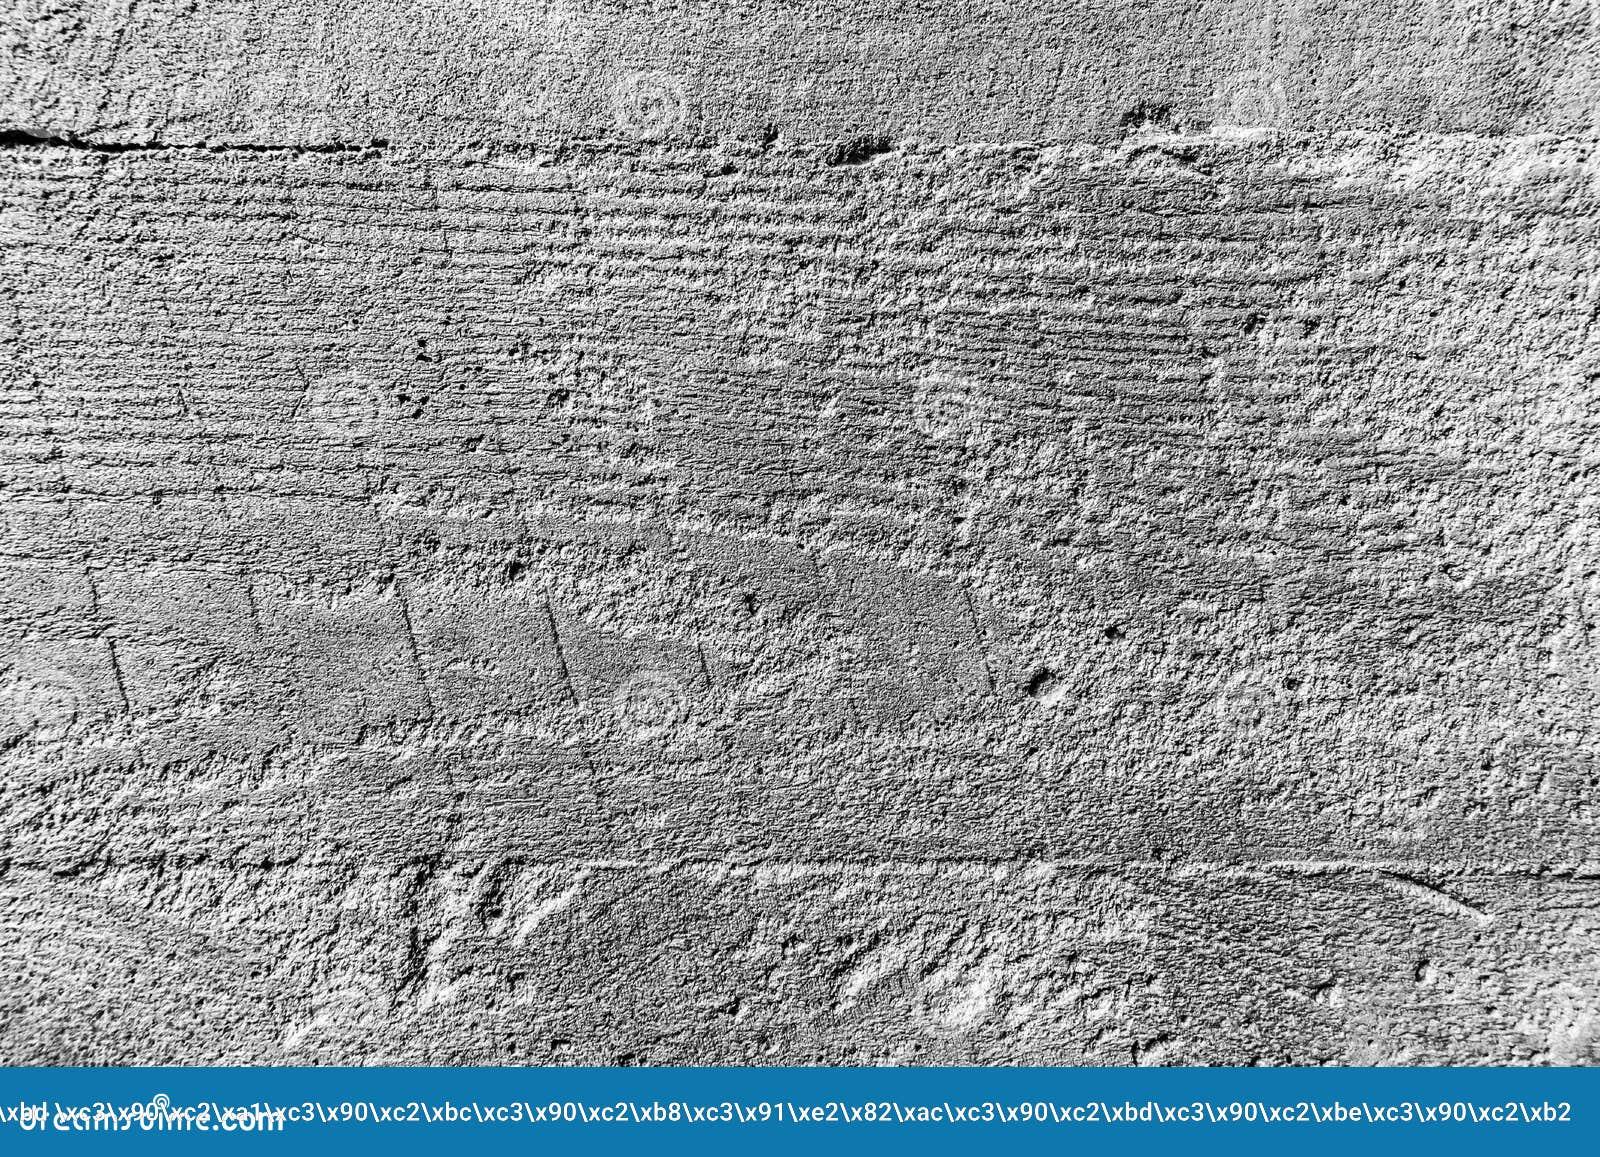 Fondo blanco de la textura de la pared de ladrillo con Gray Stripes